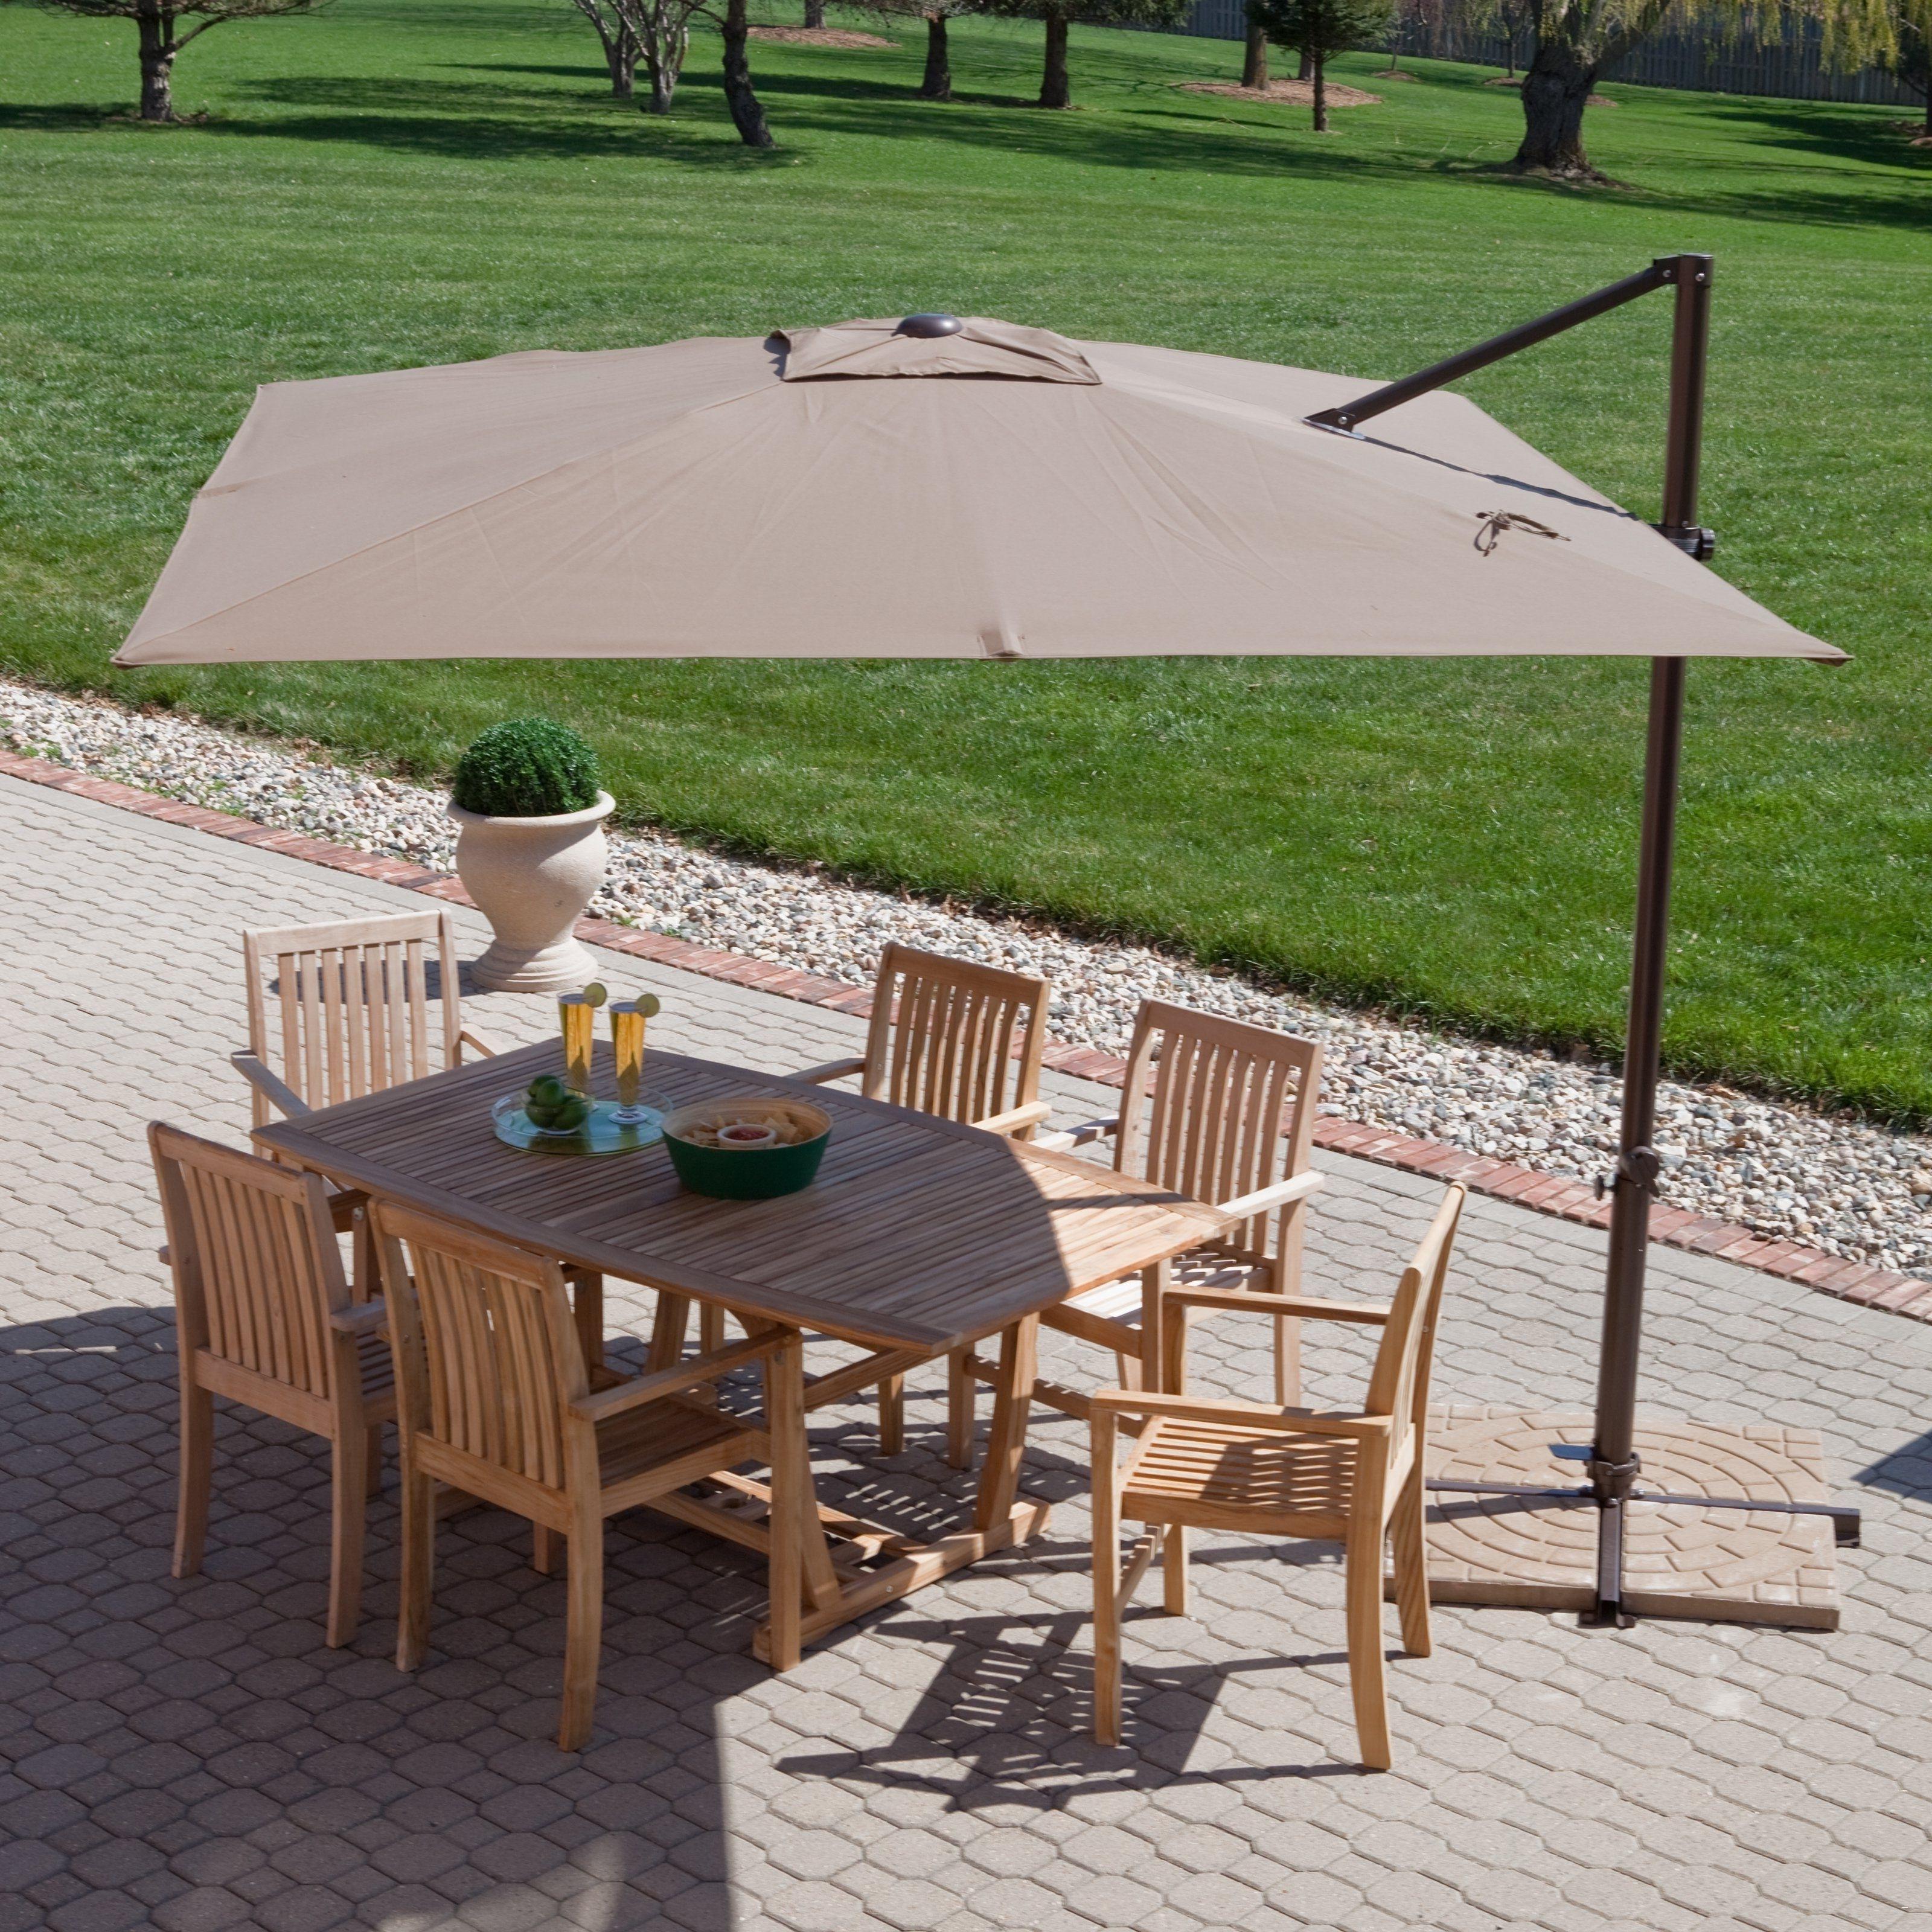 Preferred Outdoor Patio Umbrellas With Regard To Outdoor Umbrella Target Fresh Best 40 Enchanting Outdoor Patio Decor (View 16 of 20)